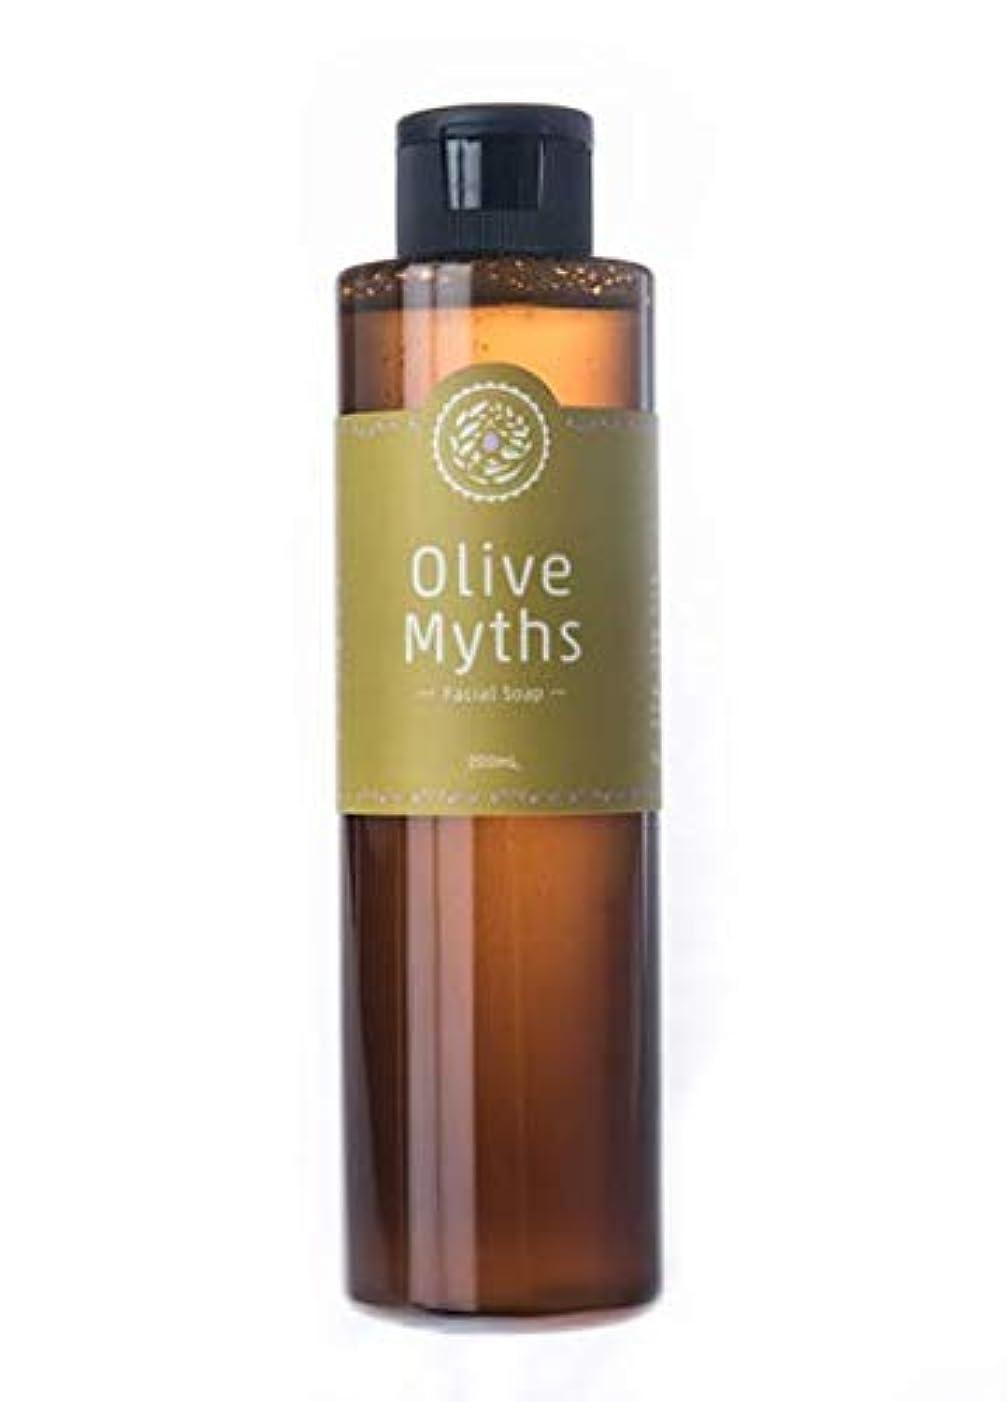 maestria. OliveMyths 『Olive Myths フェイシャルソープ』200ml MJOM-002